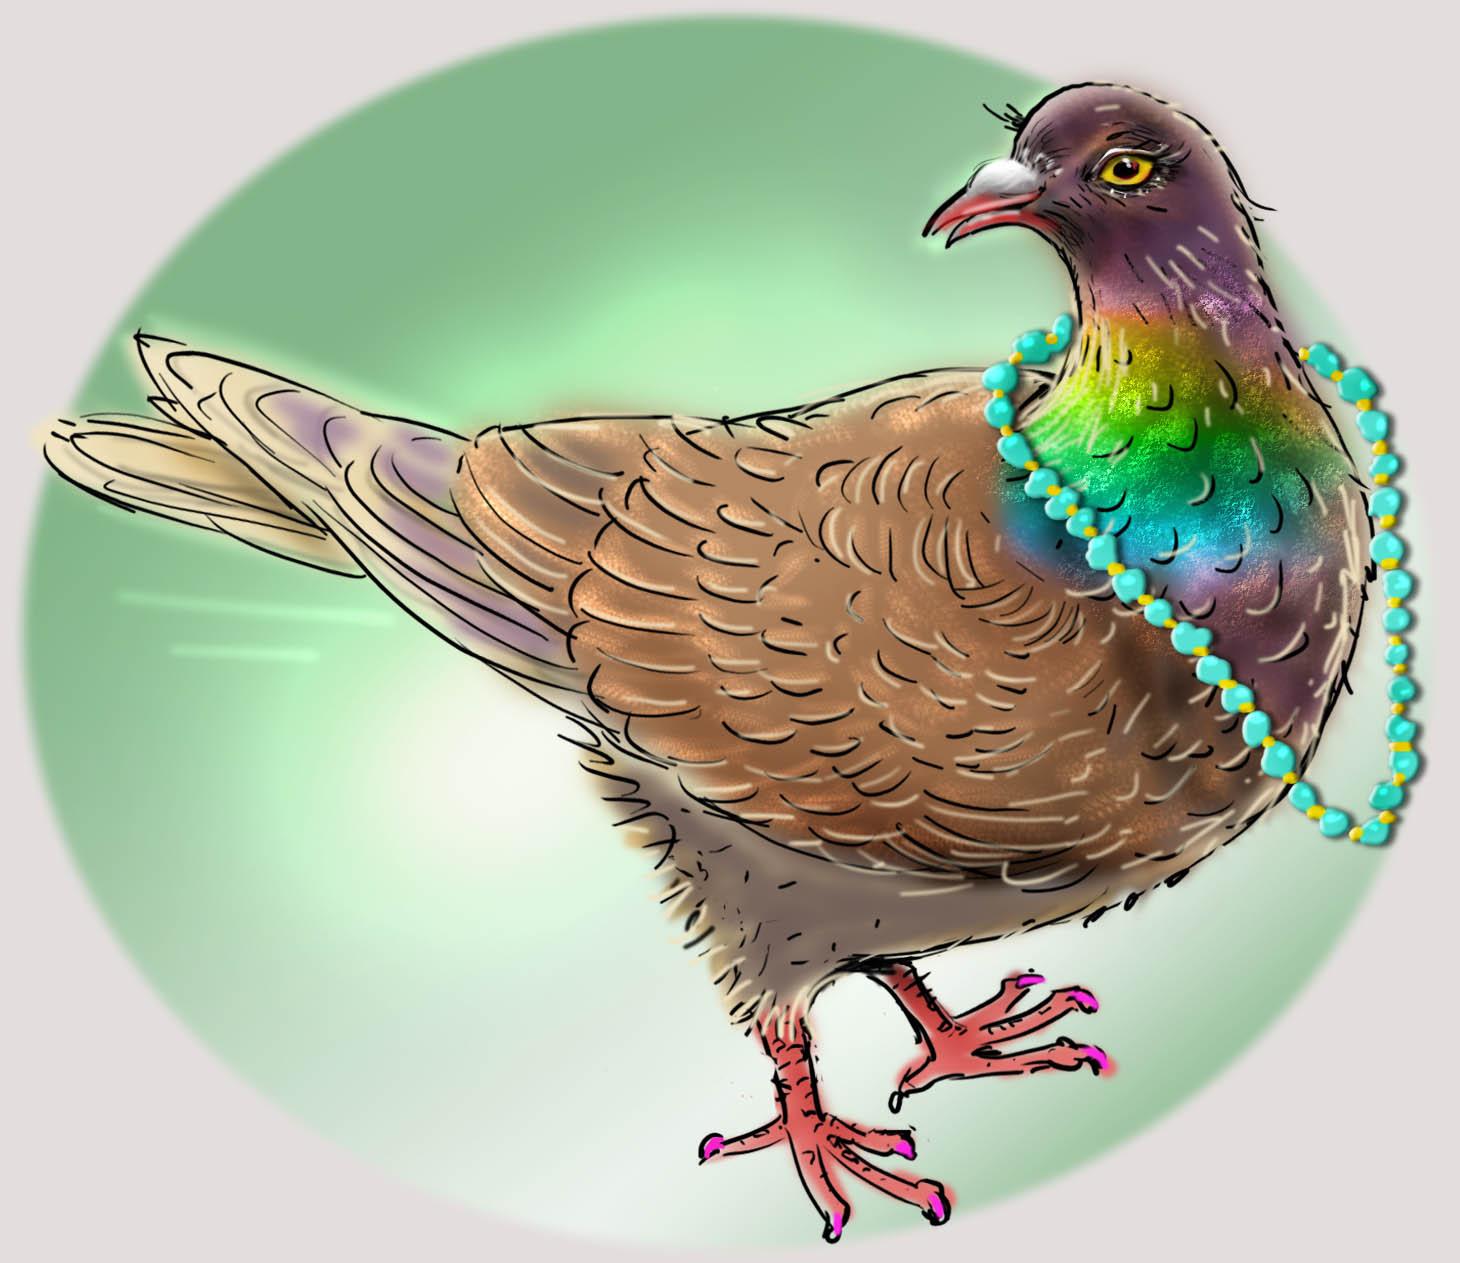 het krioelt in mokum, amsterdam dieren fabels, kinderverhaaltjes, jeannette moning, duiven